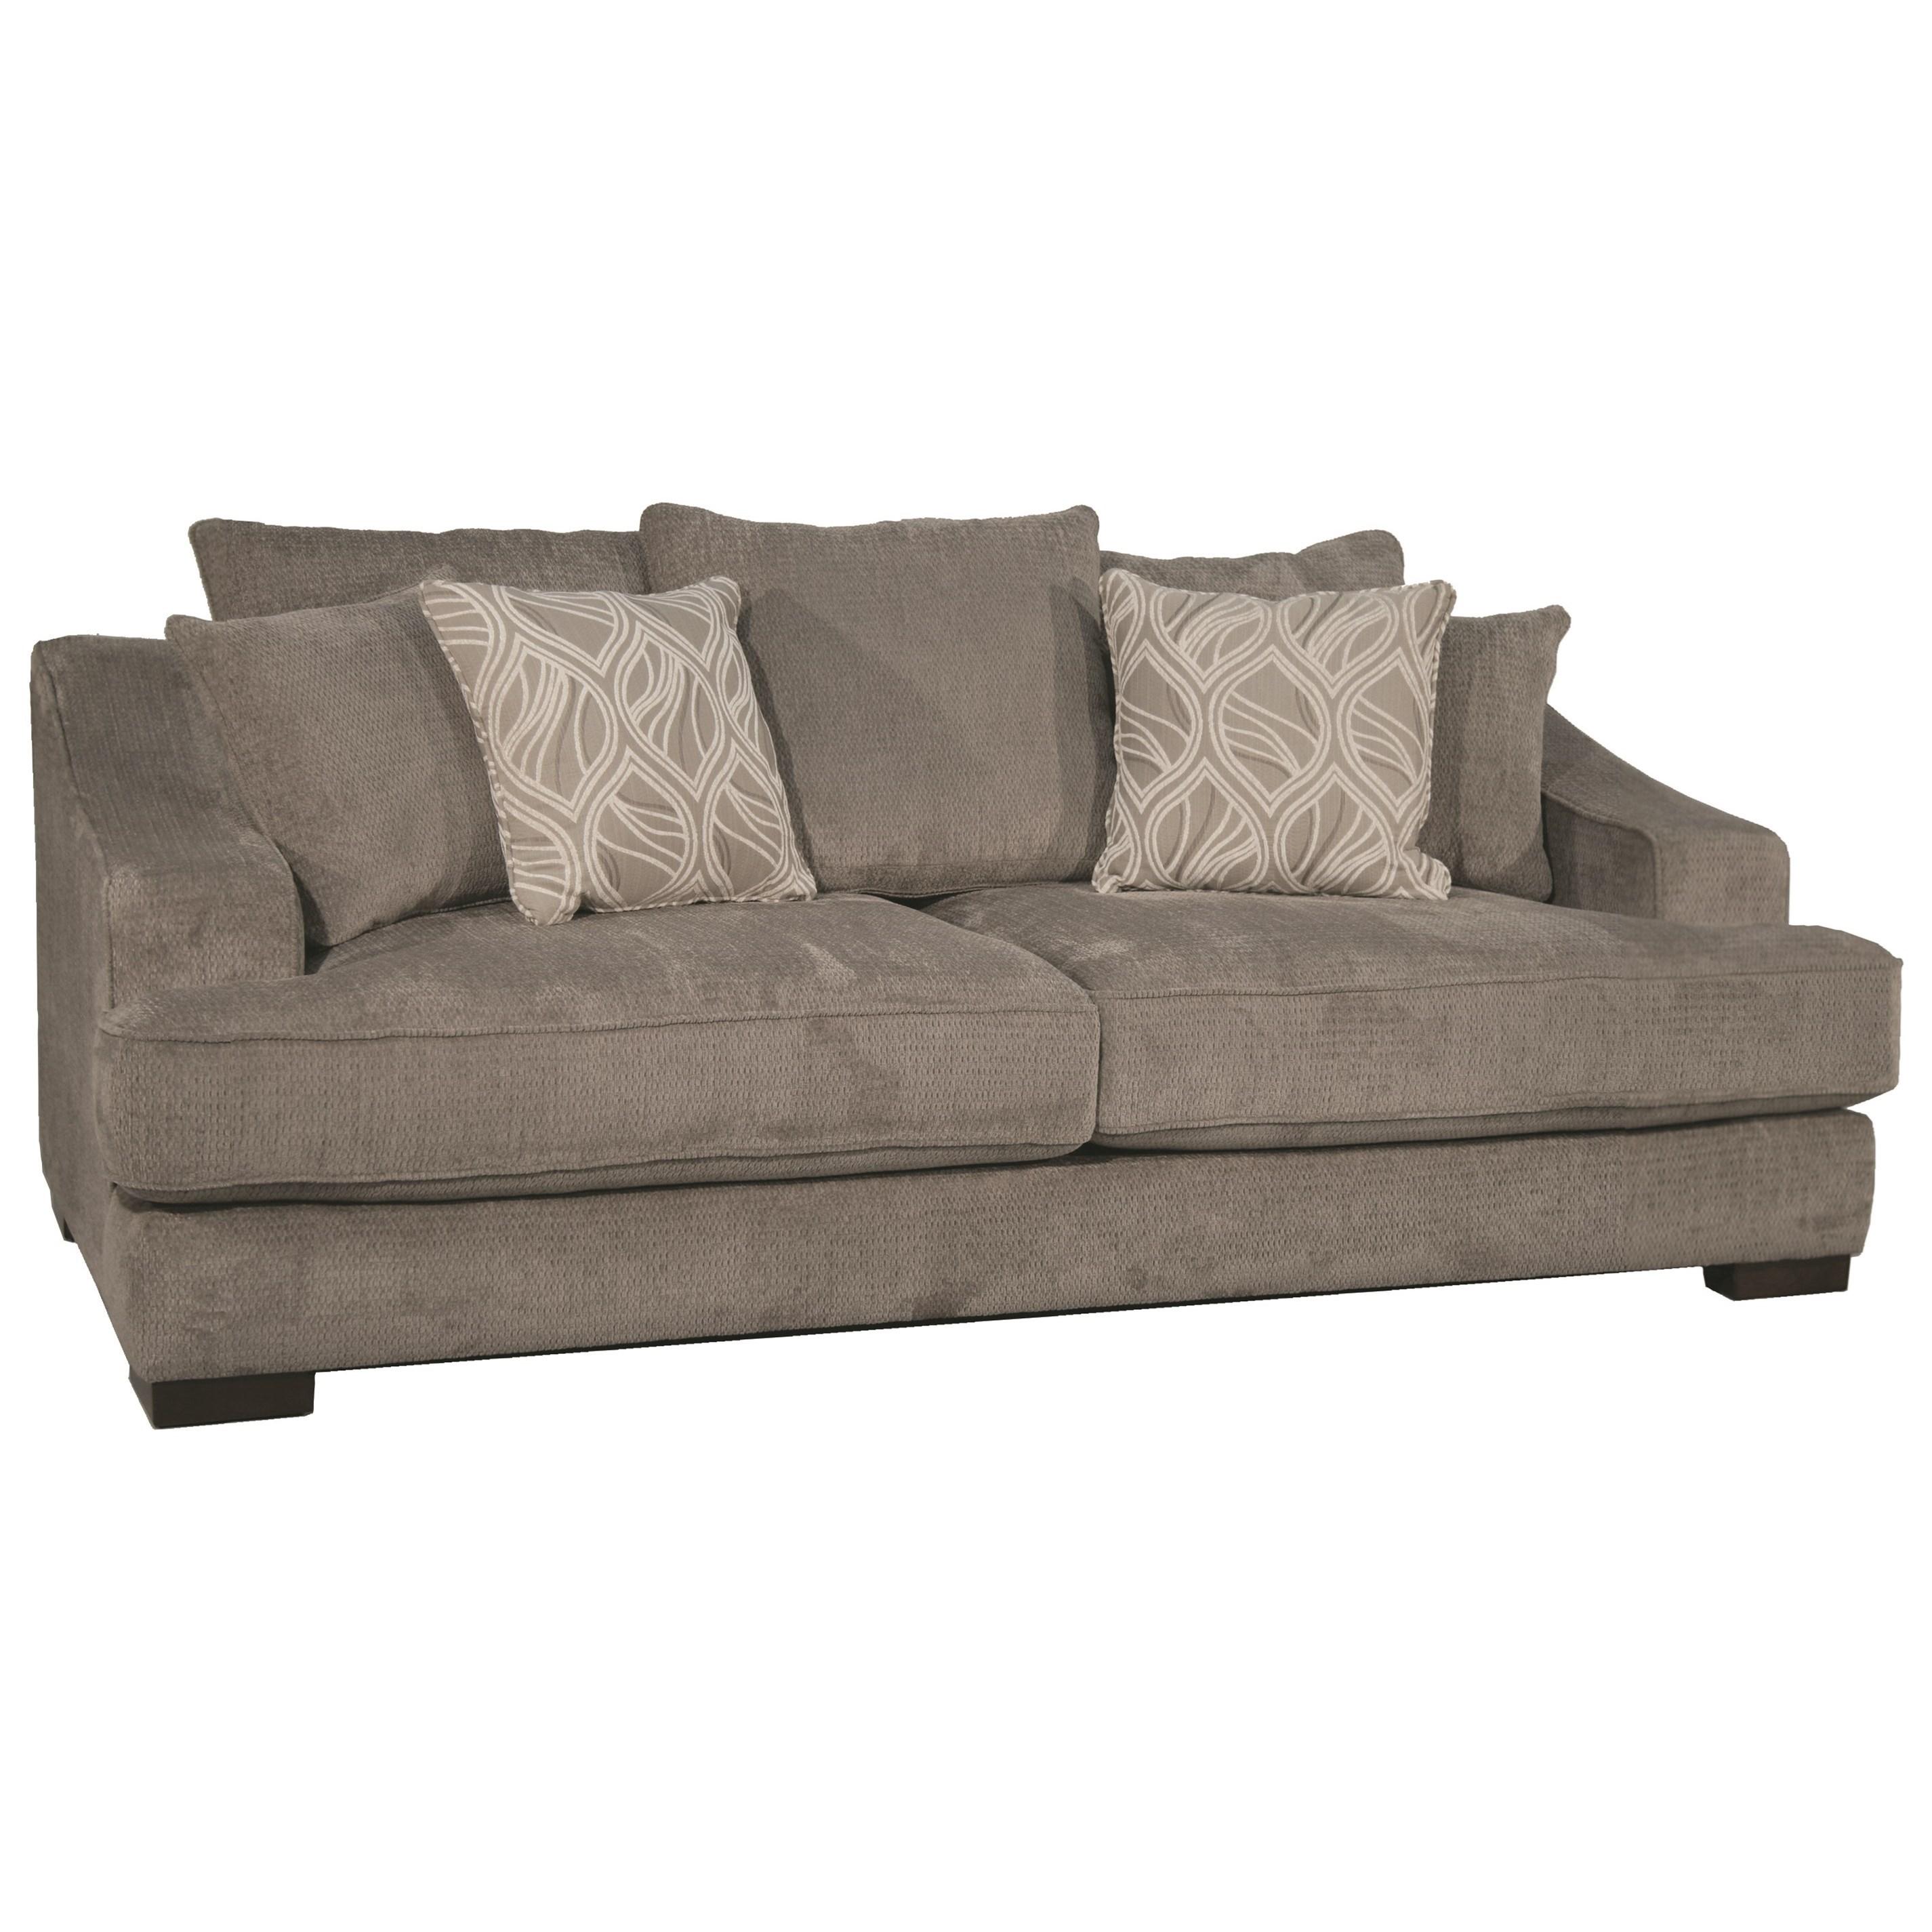 Avalon Casual Sofa by Fairmont Designs at Dream Home Interiors